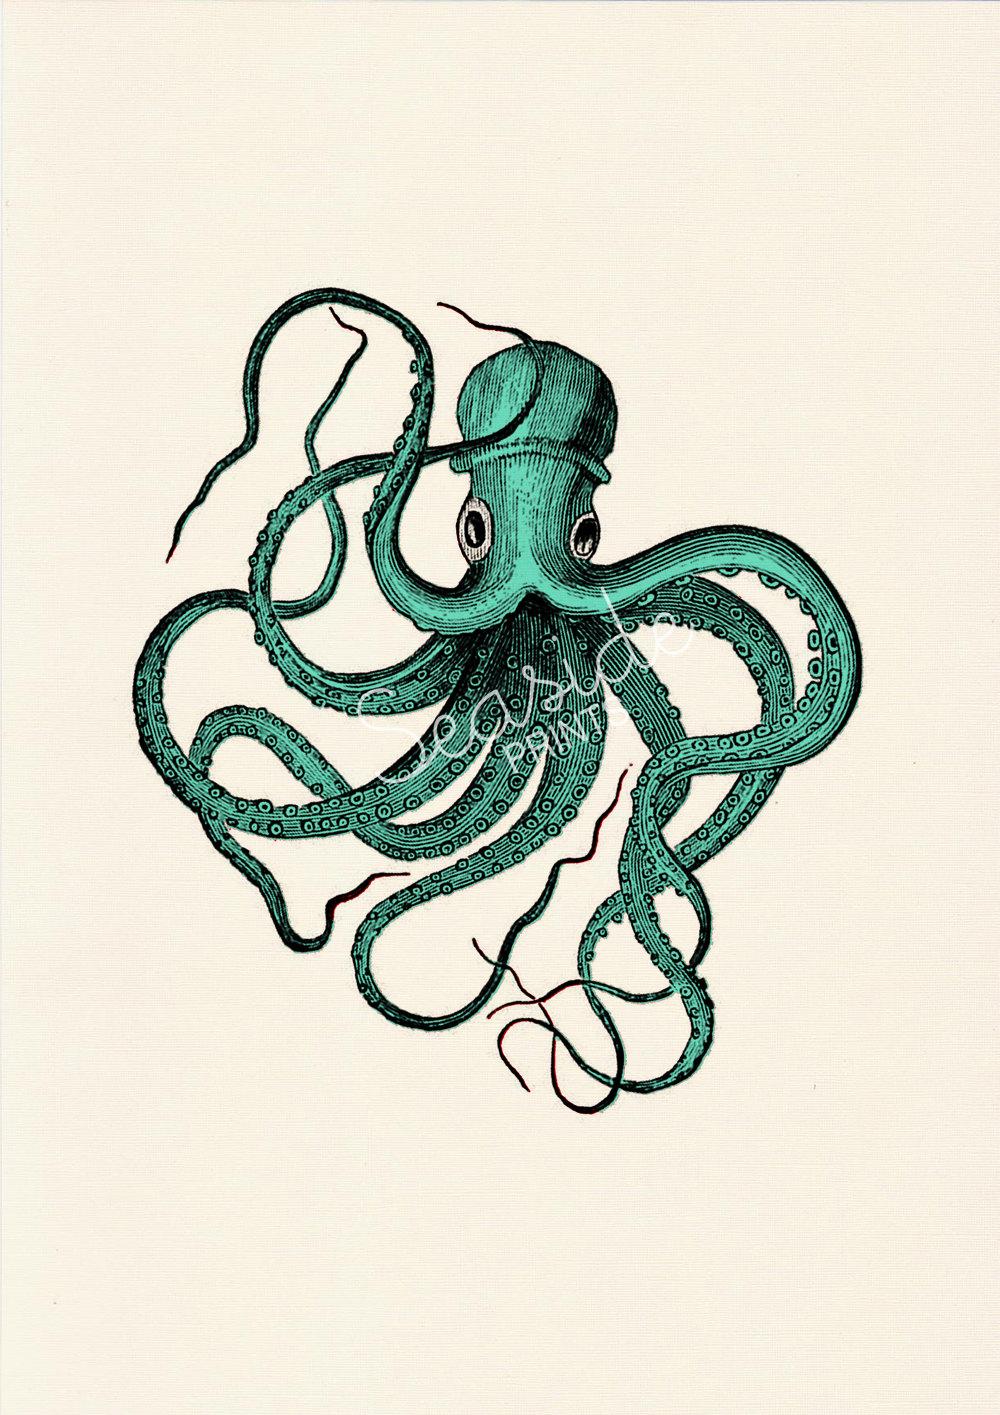 Drawn sea life octopus Wall sea color Print art